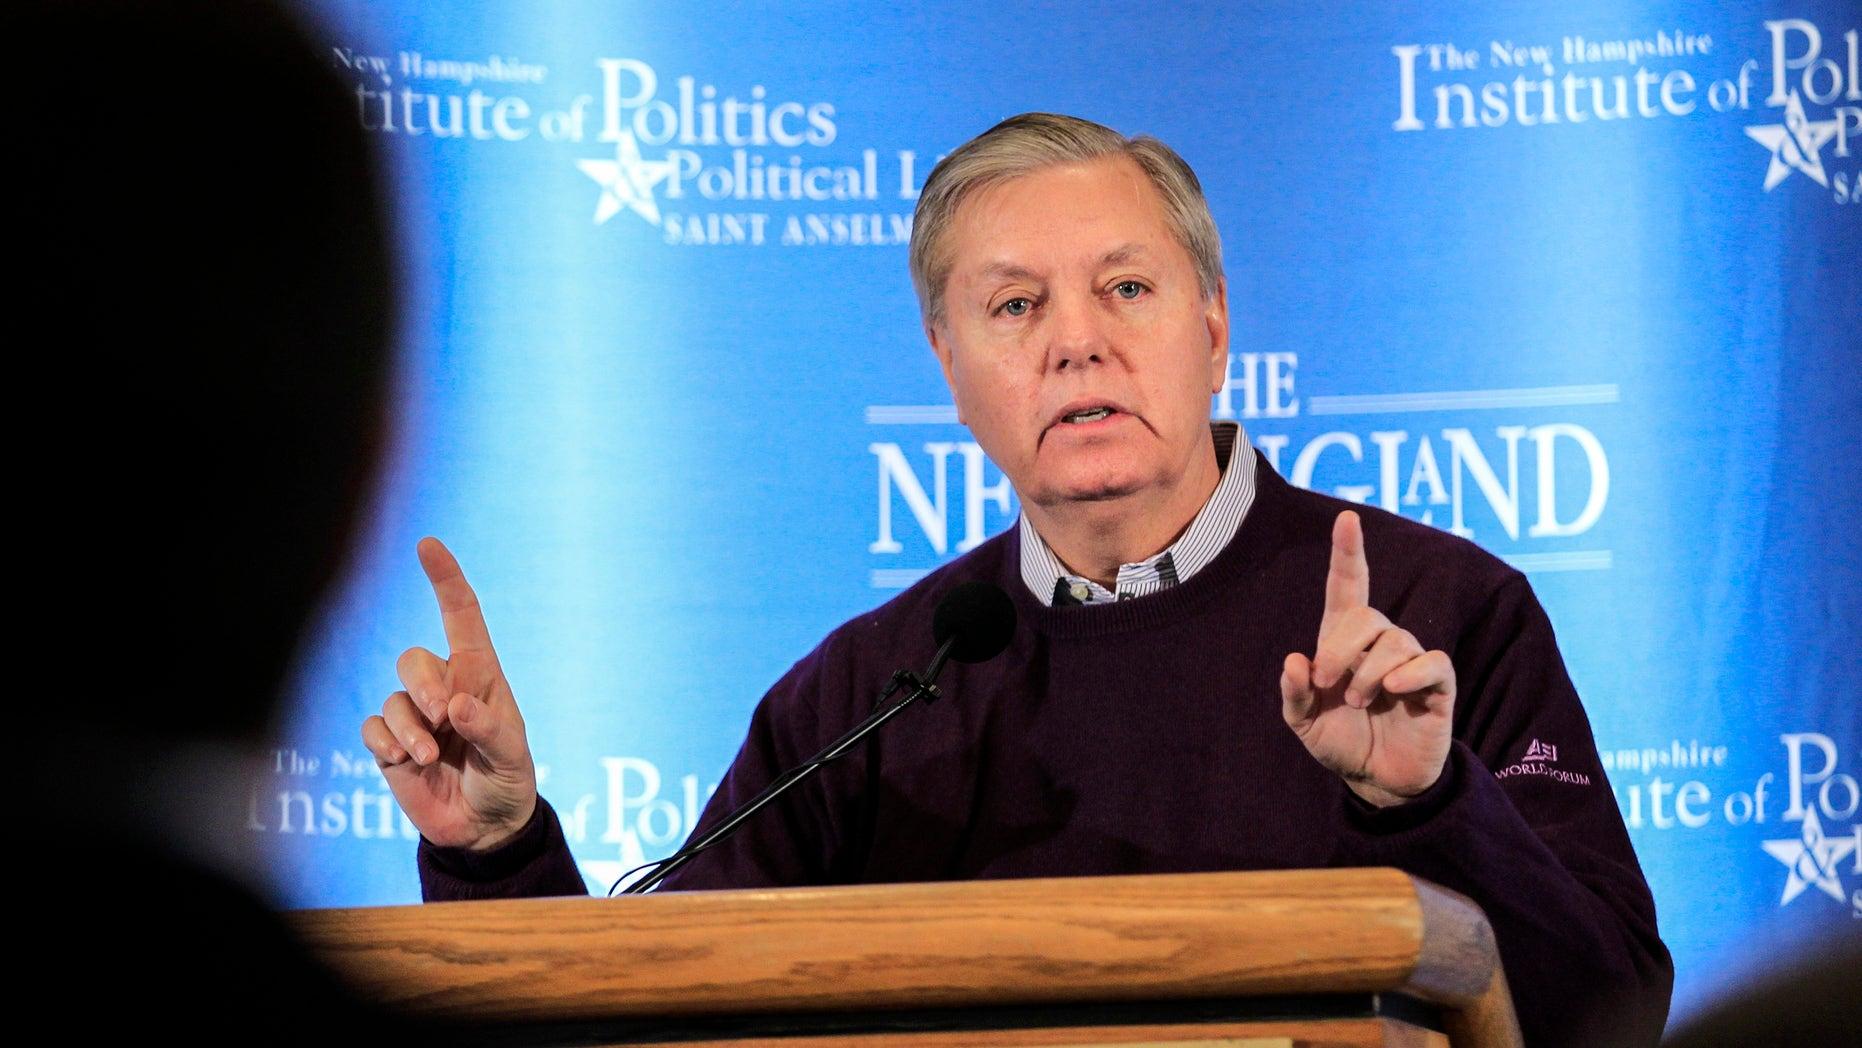 U.S. Sen. Lindsey Graham of South Carolina on March 9, 2015.